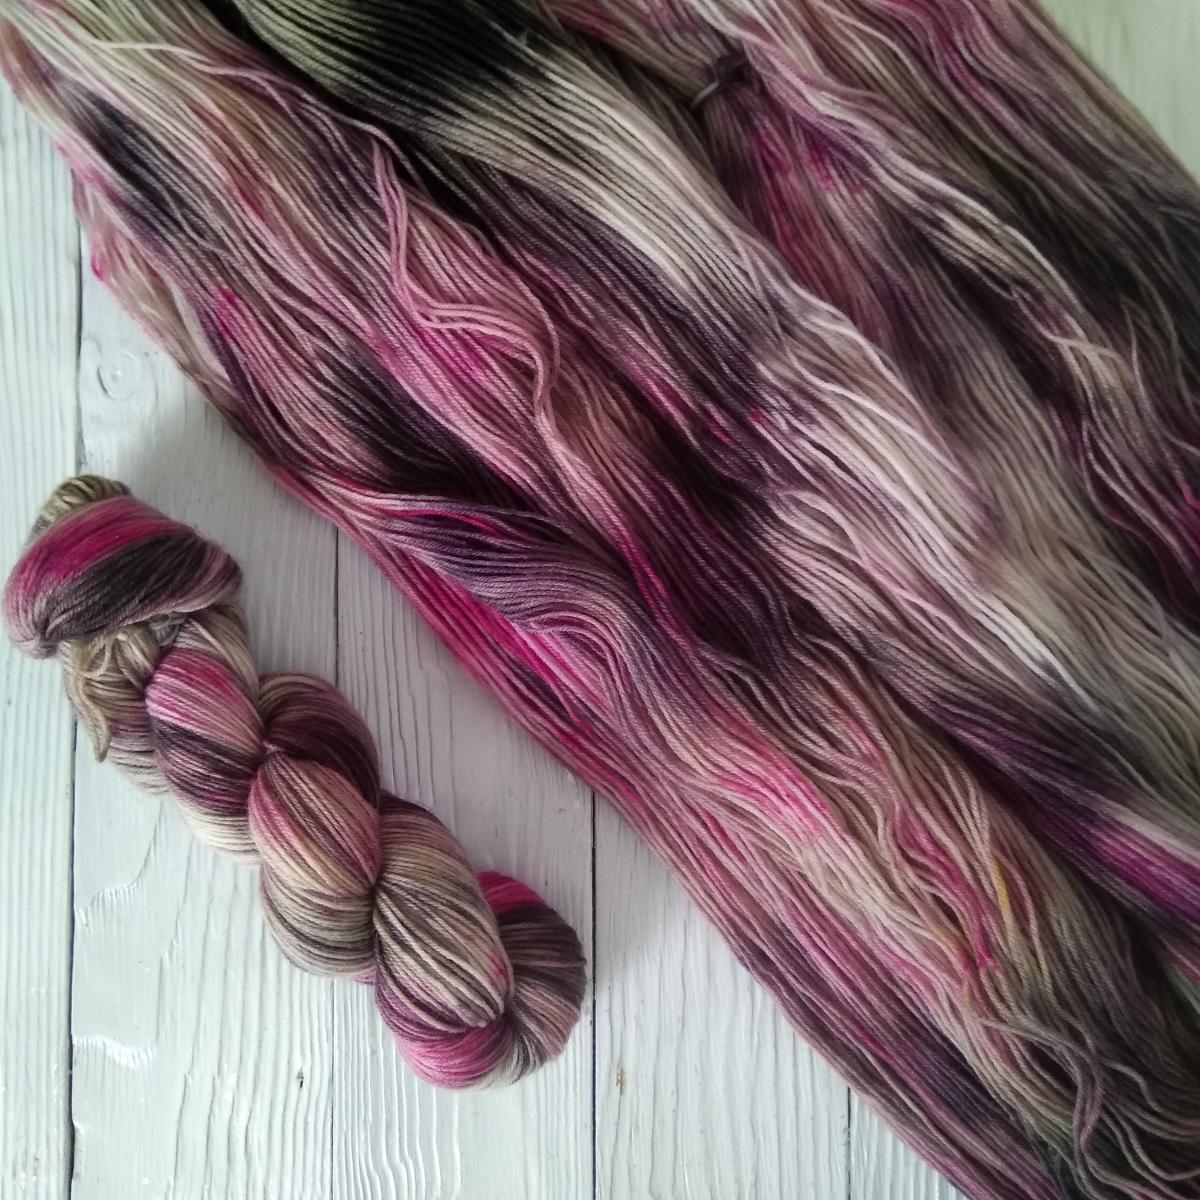 woodico.pro hand dyed yarn 037 1200x1200 - Hand dyed yarn / 037